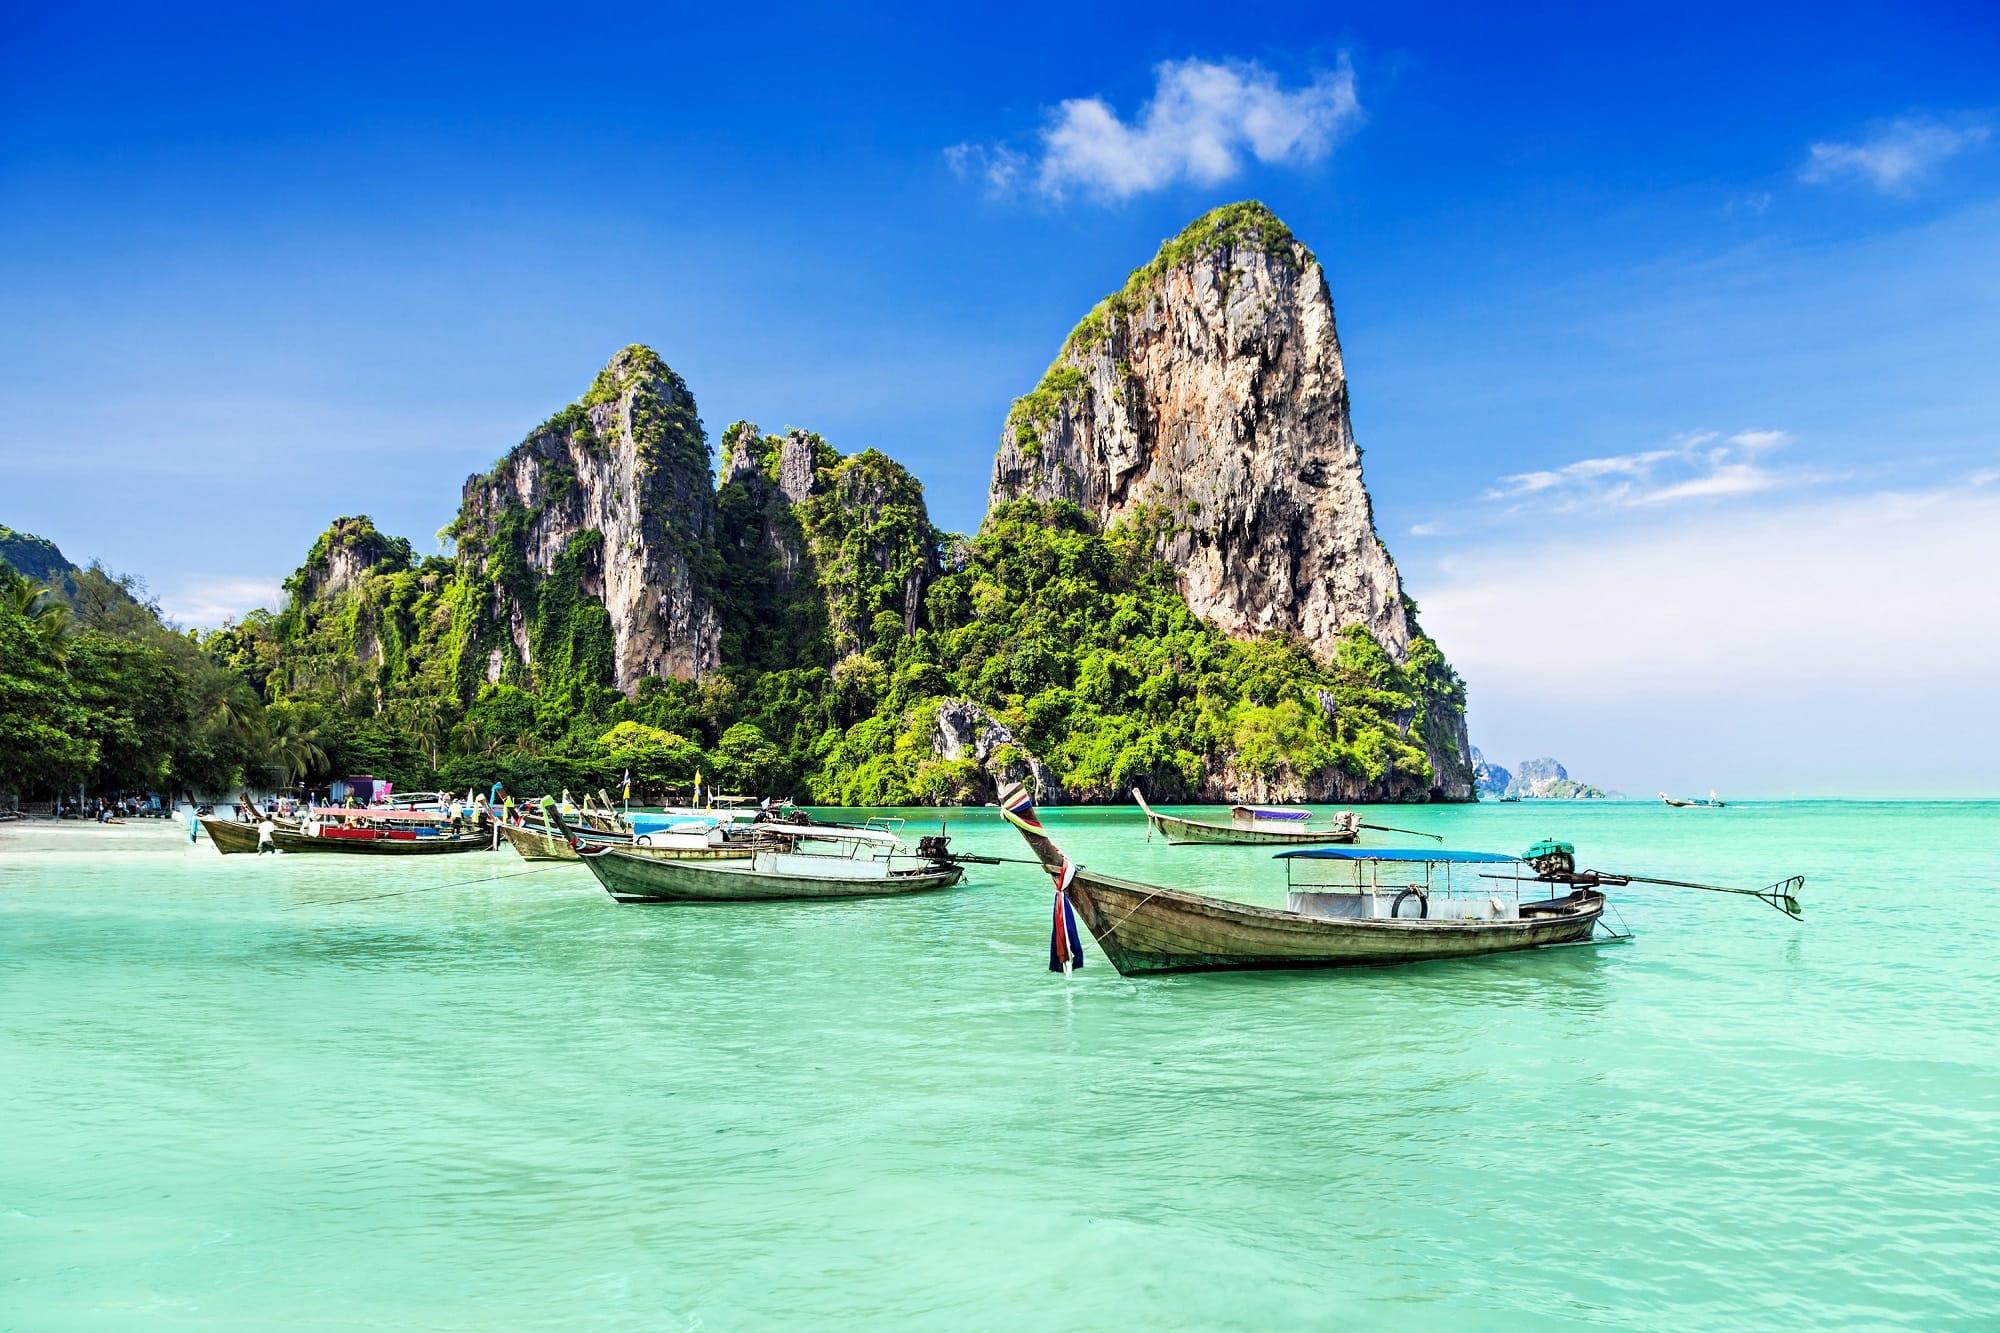 week30_1_Phuket Thailand beach